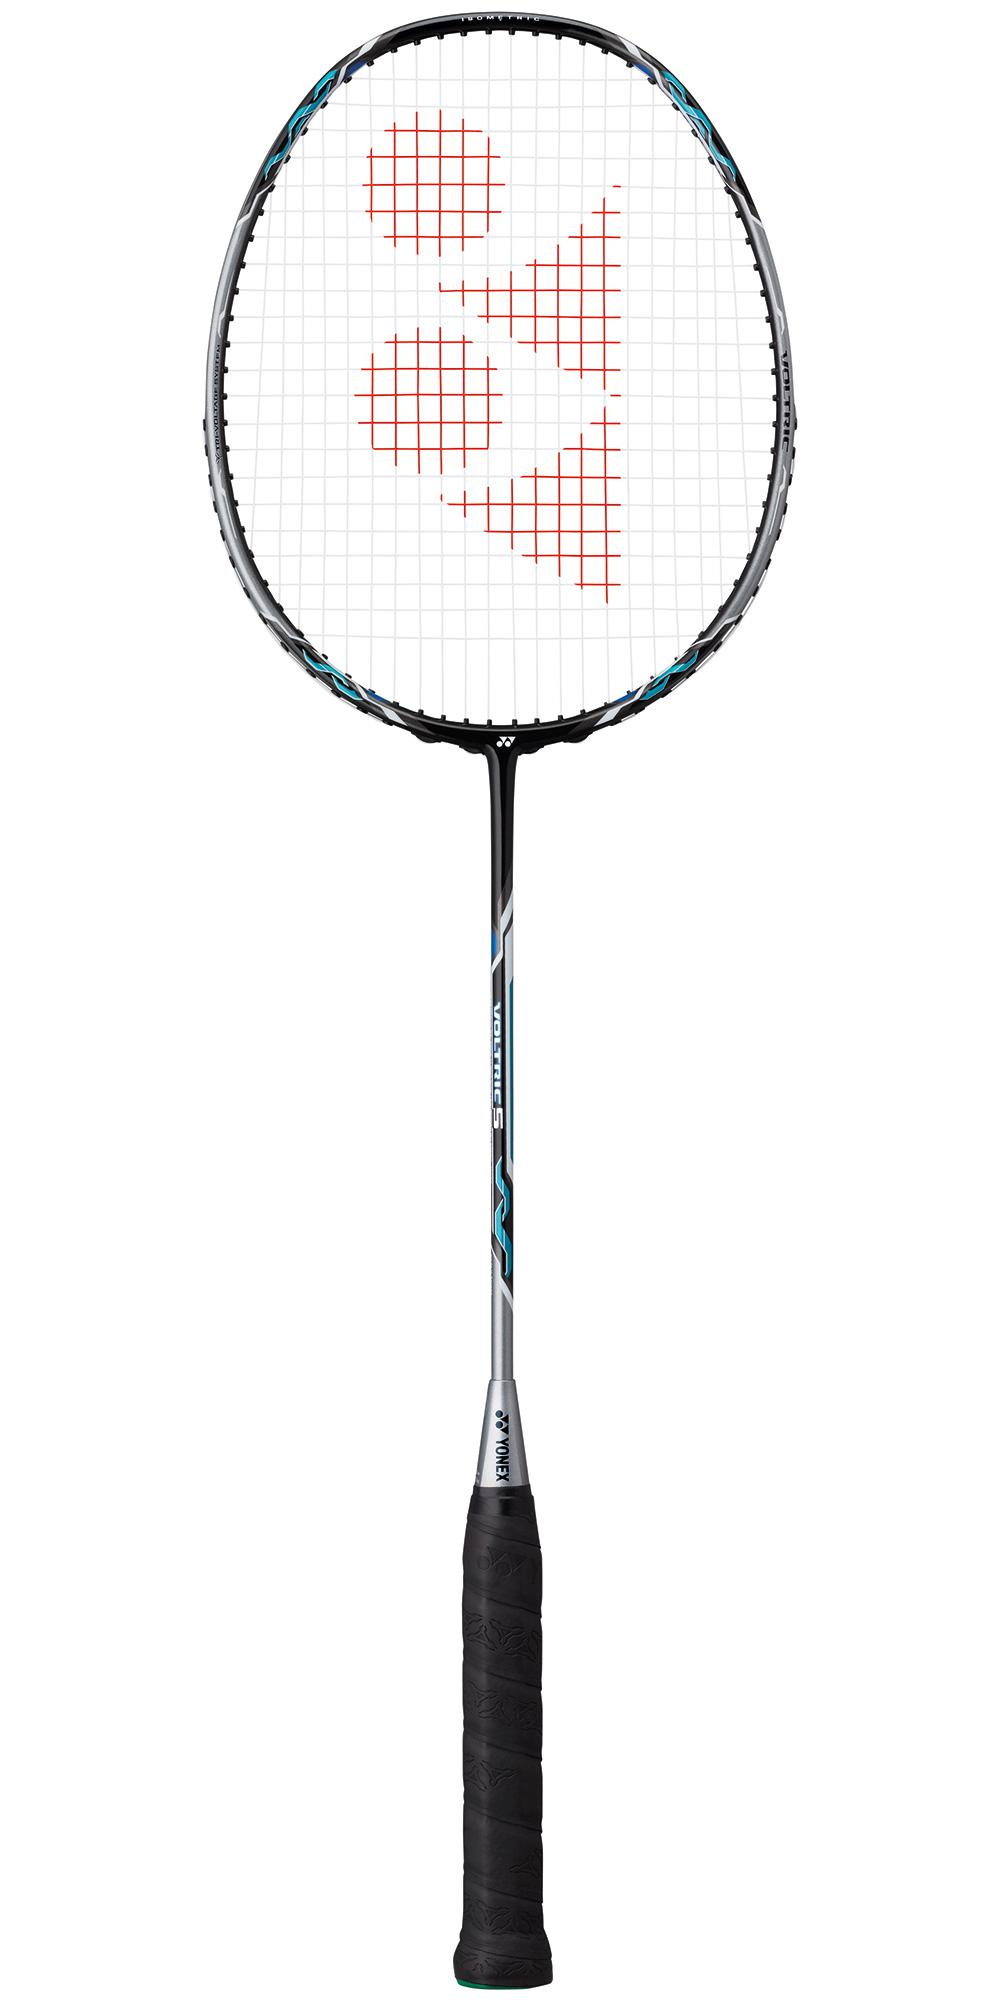 Yonex Voltric 5 Badminton Racket - Black/Blue (2016 ...